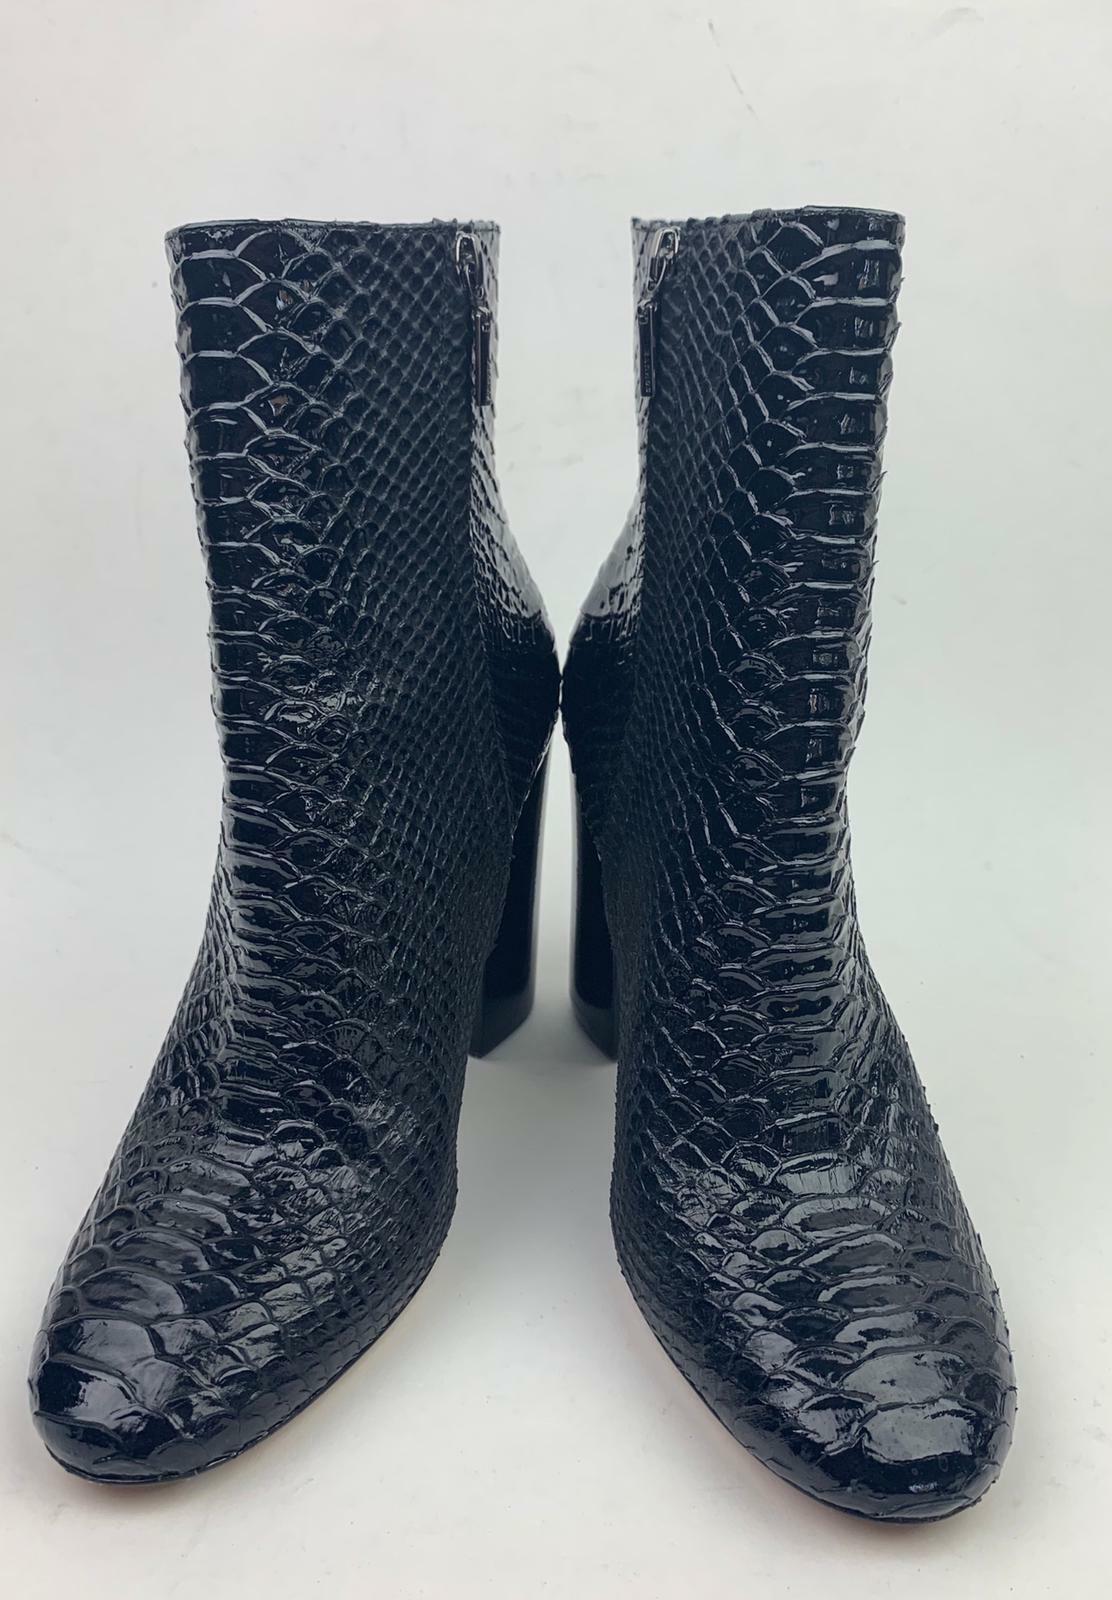 Shultz block heel crocodile embossed booties sz 10